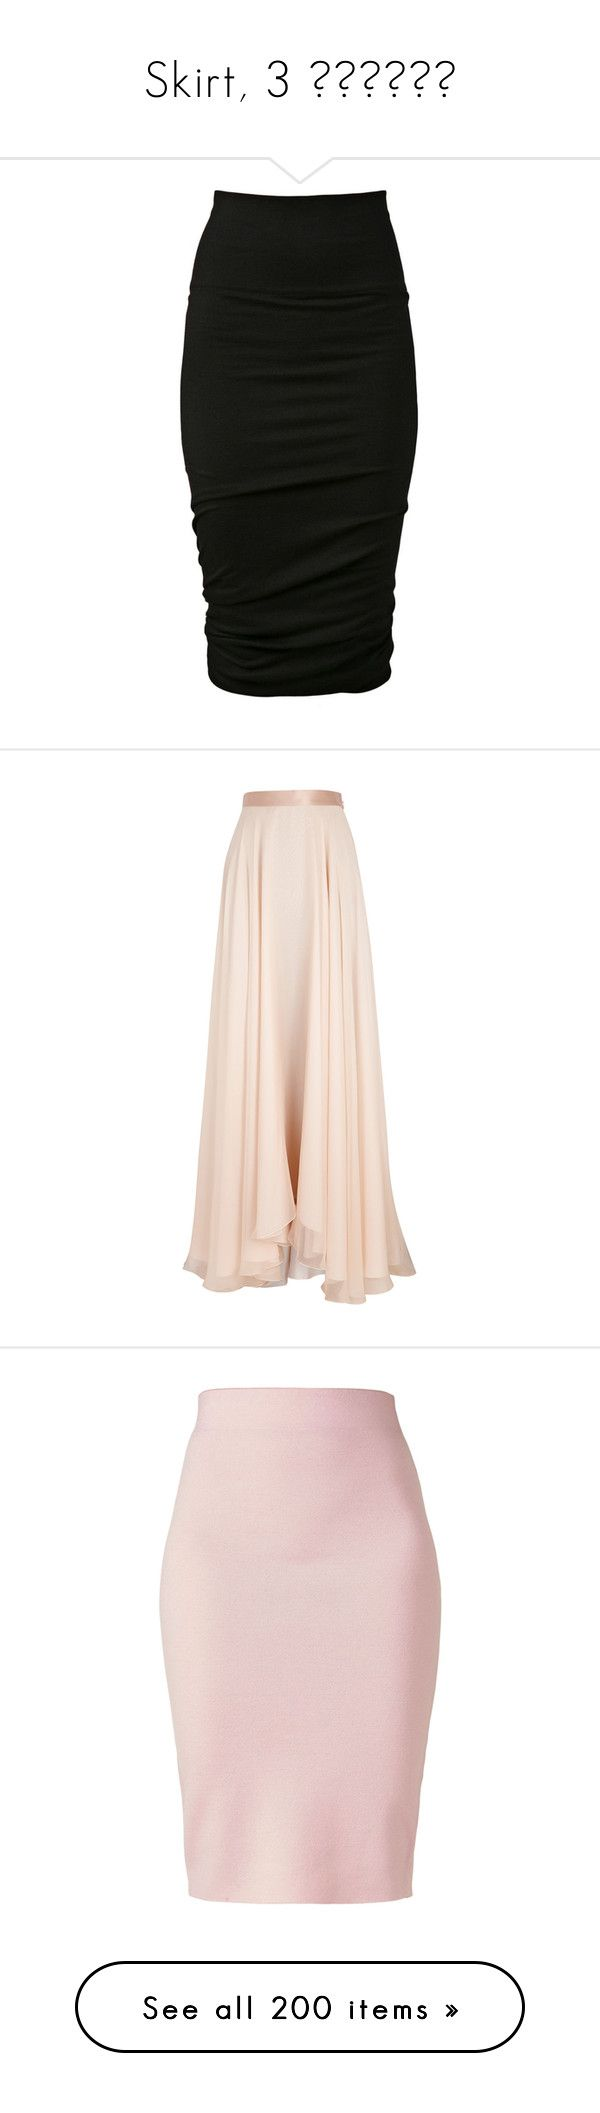 """Skirt, 3 تنانير"" by isror ❤ liked on Polyvore featuring skirts, black, mid length skirts, twist skirt, tube skirt, elastic waist skirt, sheer maxi skirt, pink flare skirt, flare skirt and sheer skirt"